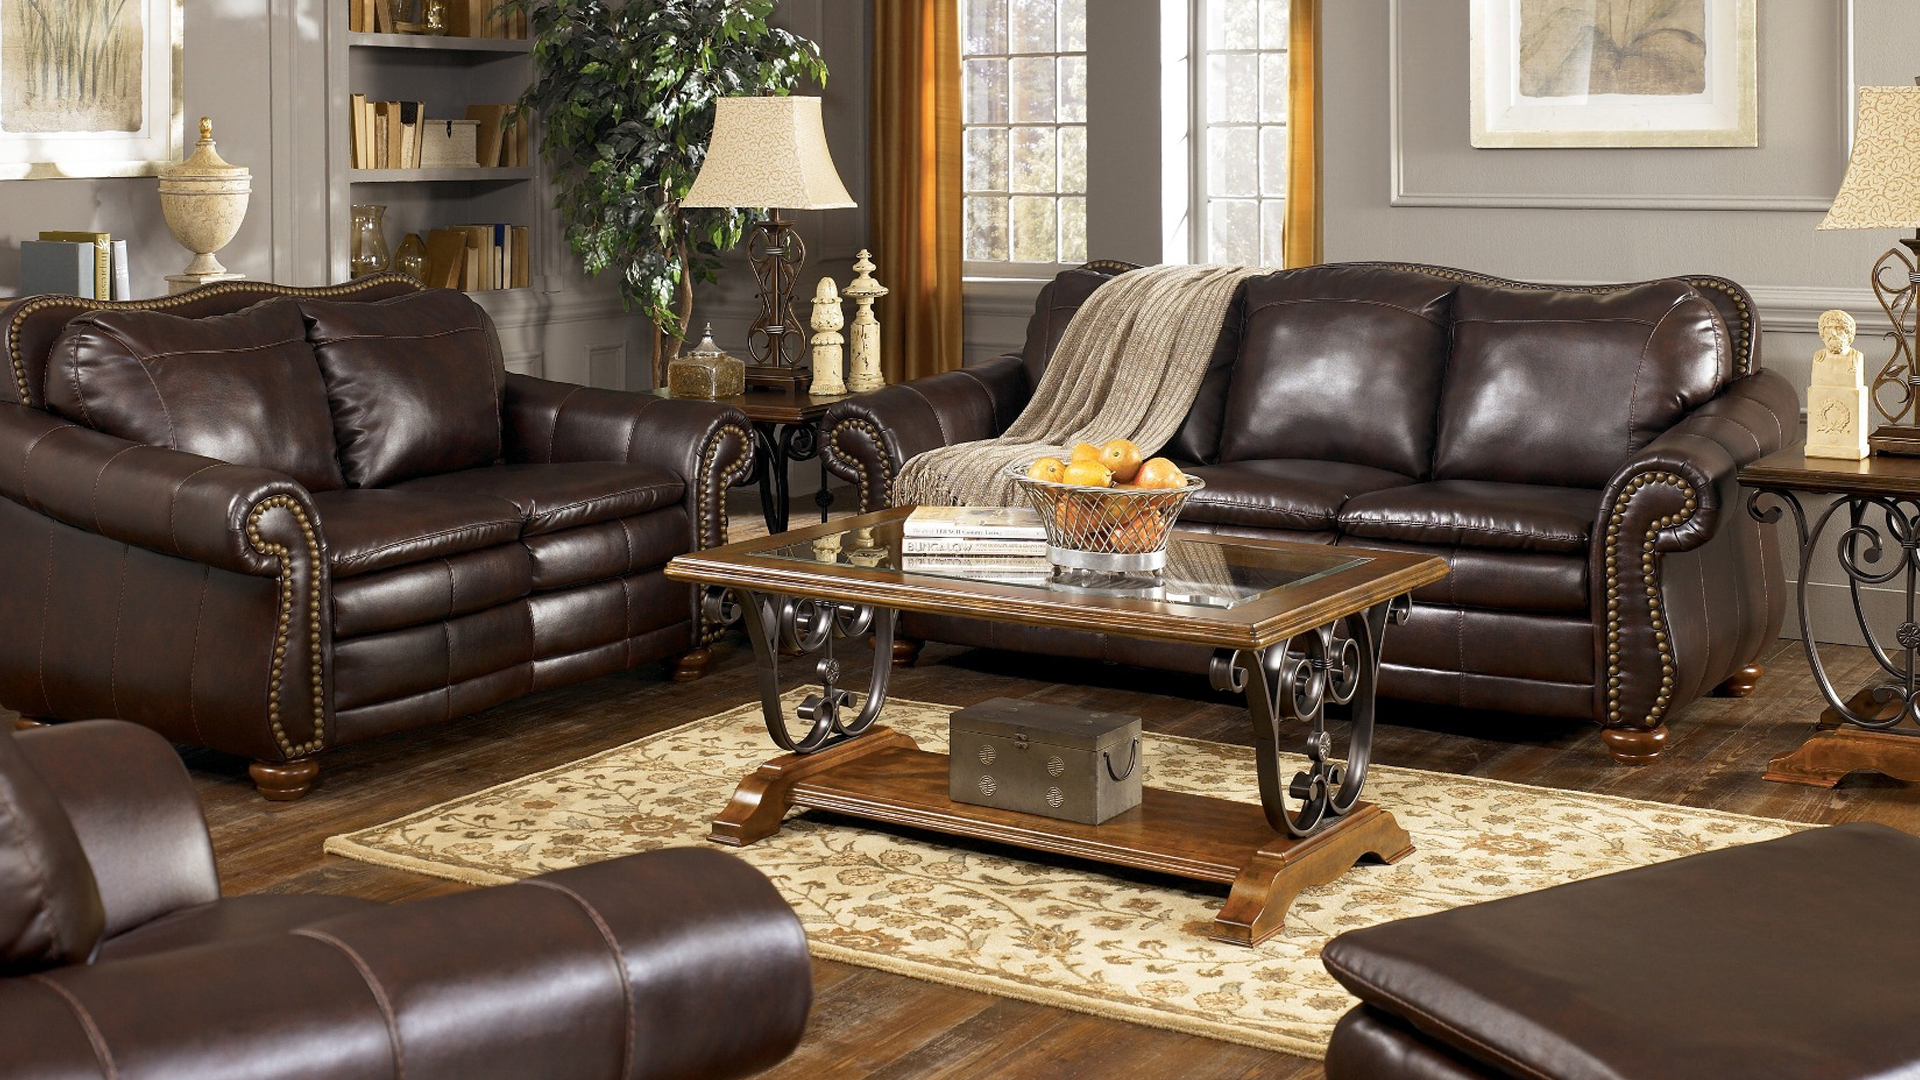 American-Carpet-Wholesalers-Flooring-area-rugs